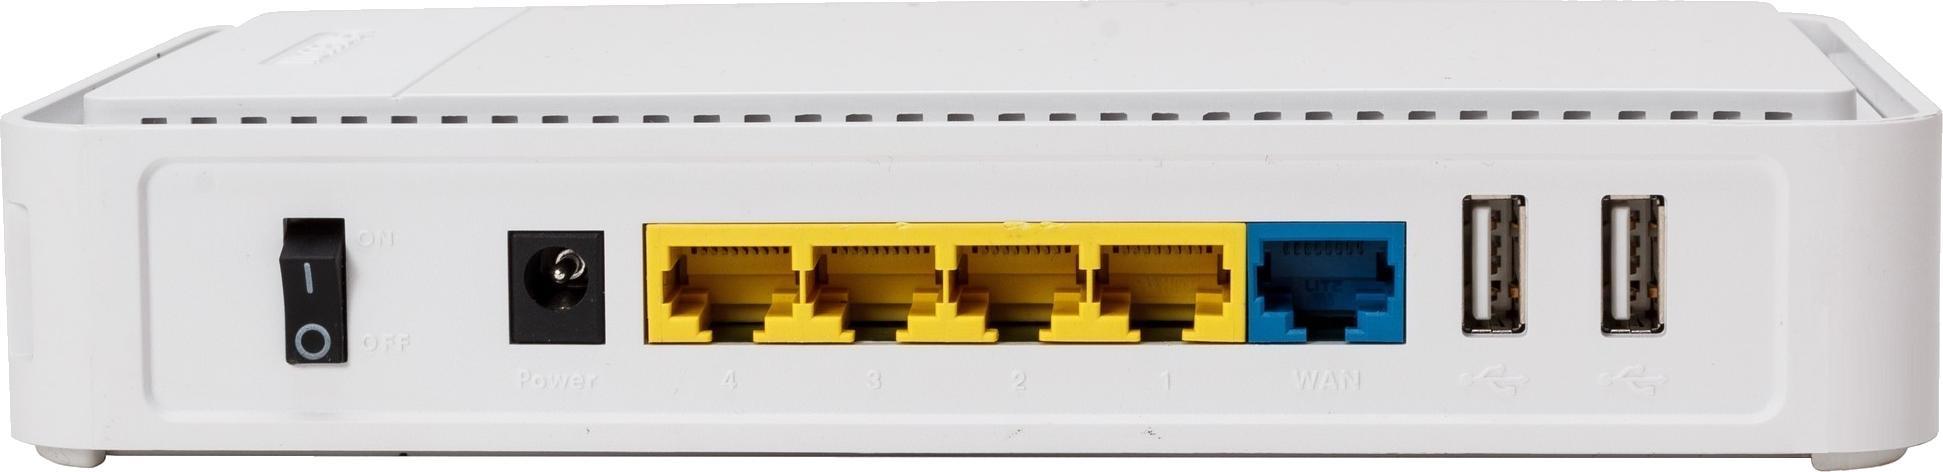 Sitecom WLR-8100